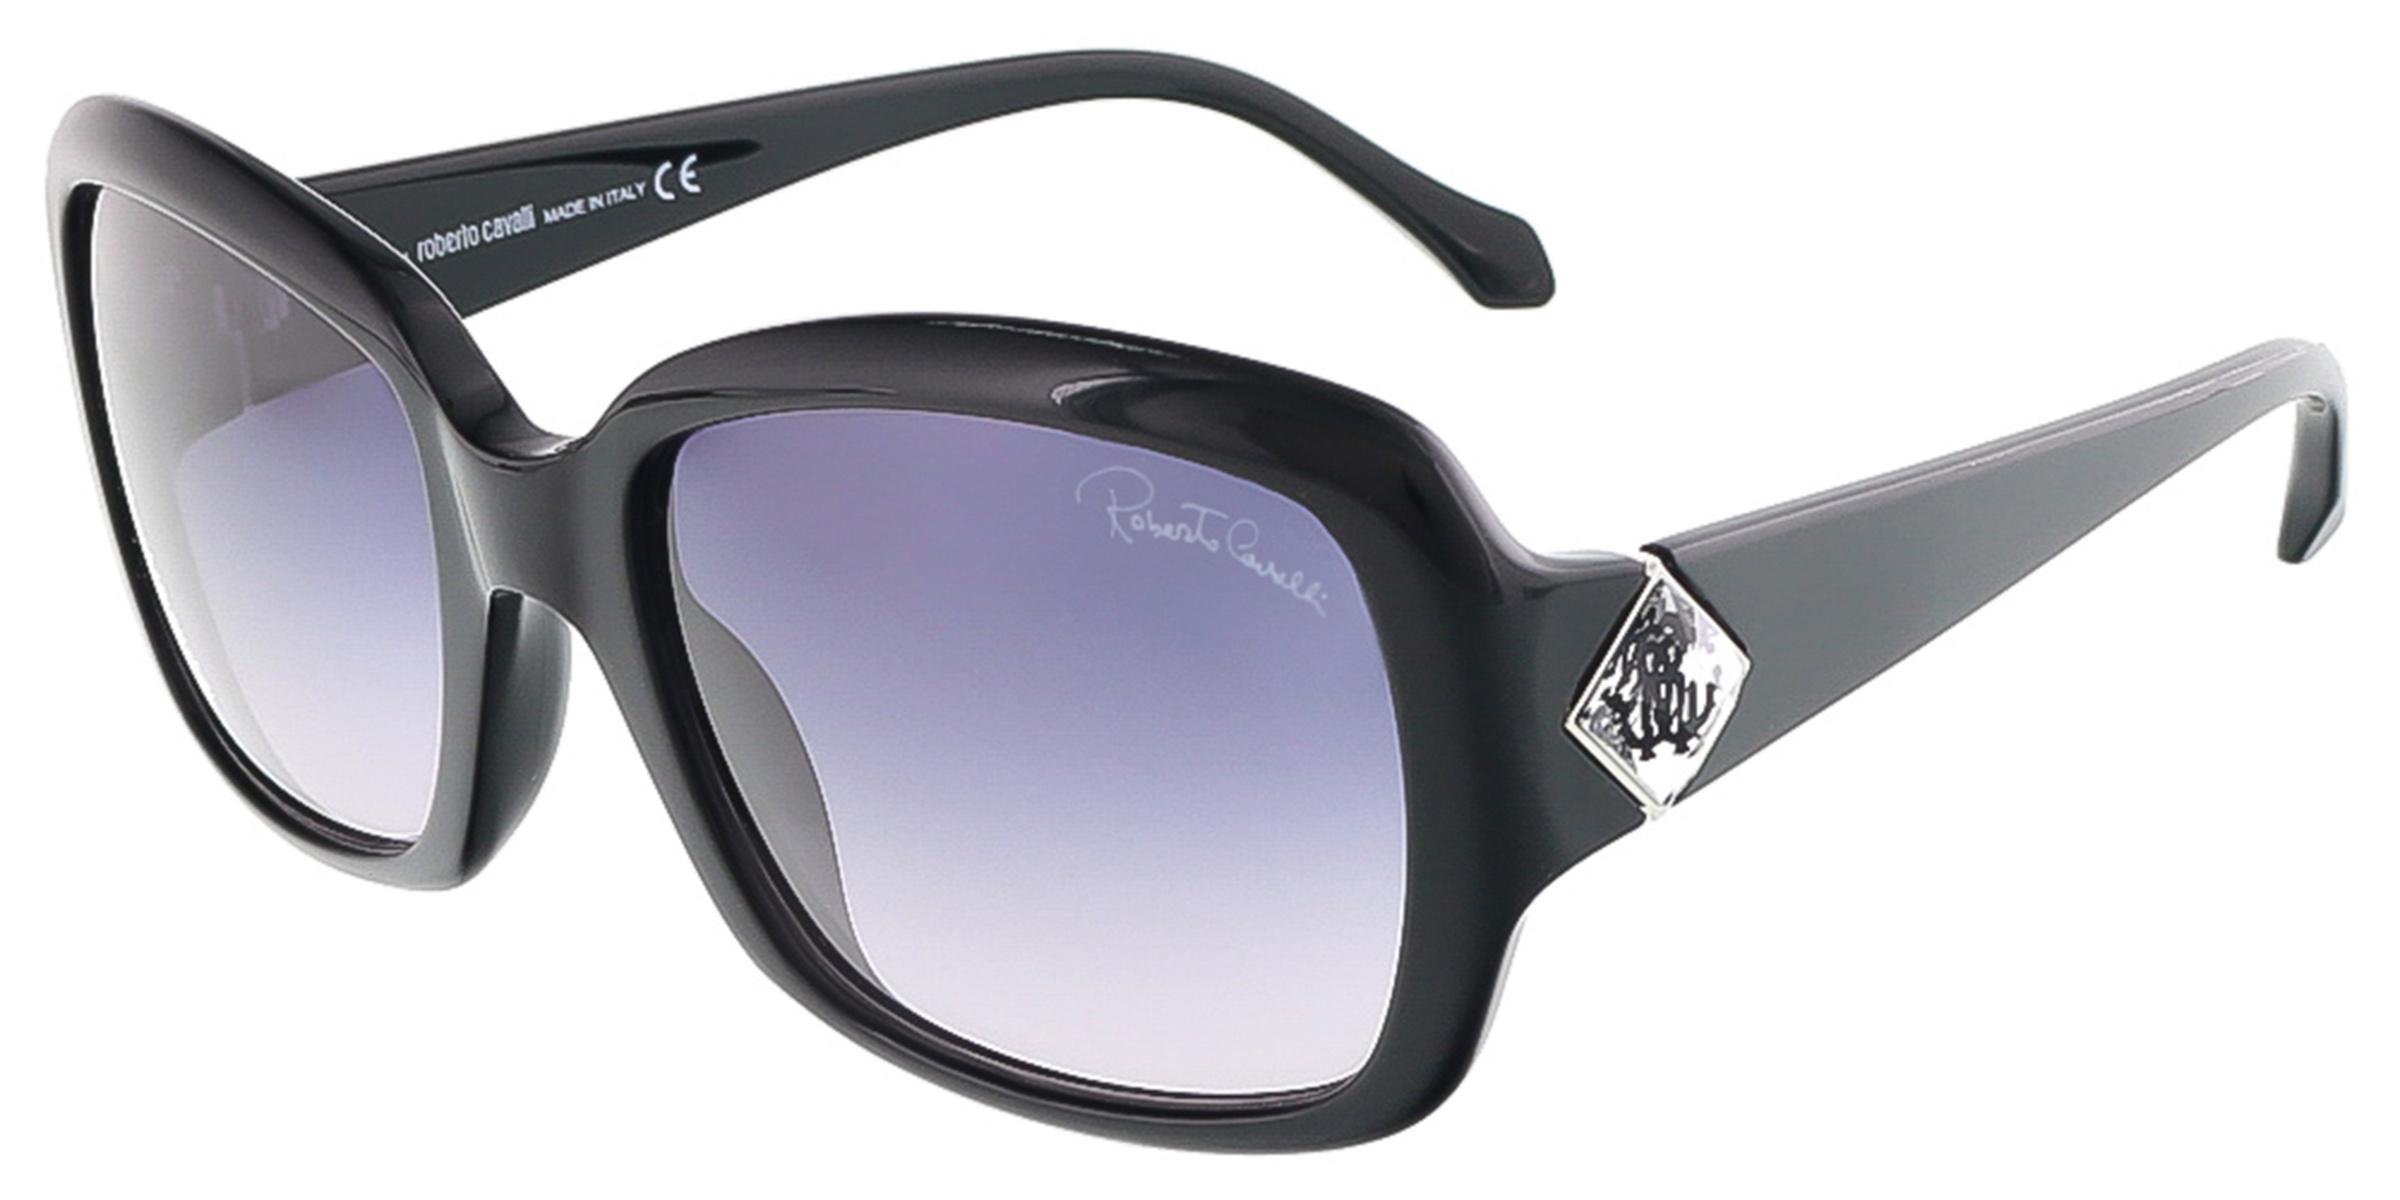 Roberto Cavalli RC881S/S 01B MAIA Shiny Black Square sunglasses